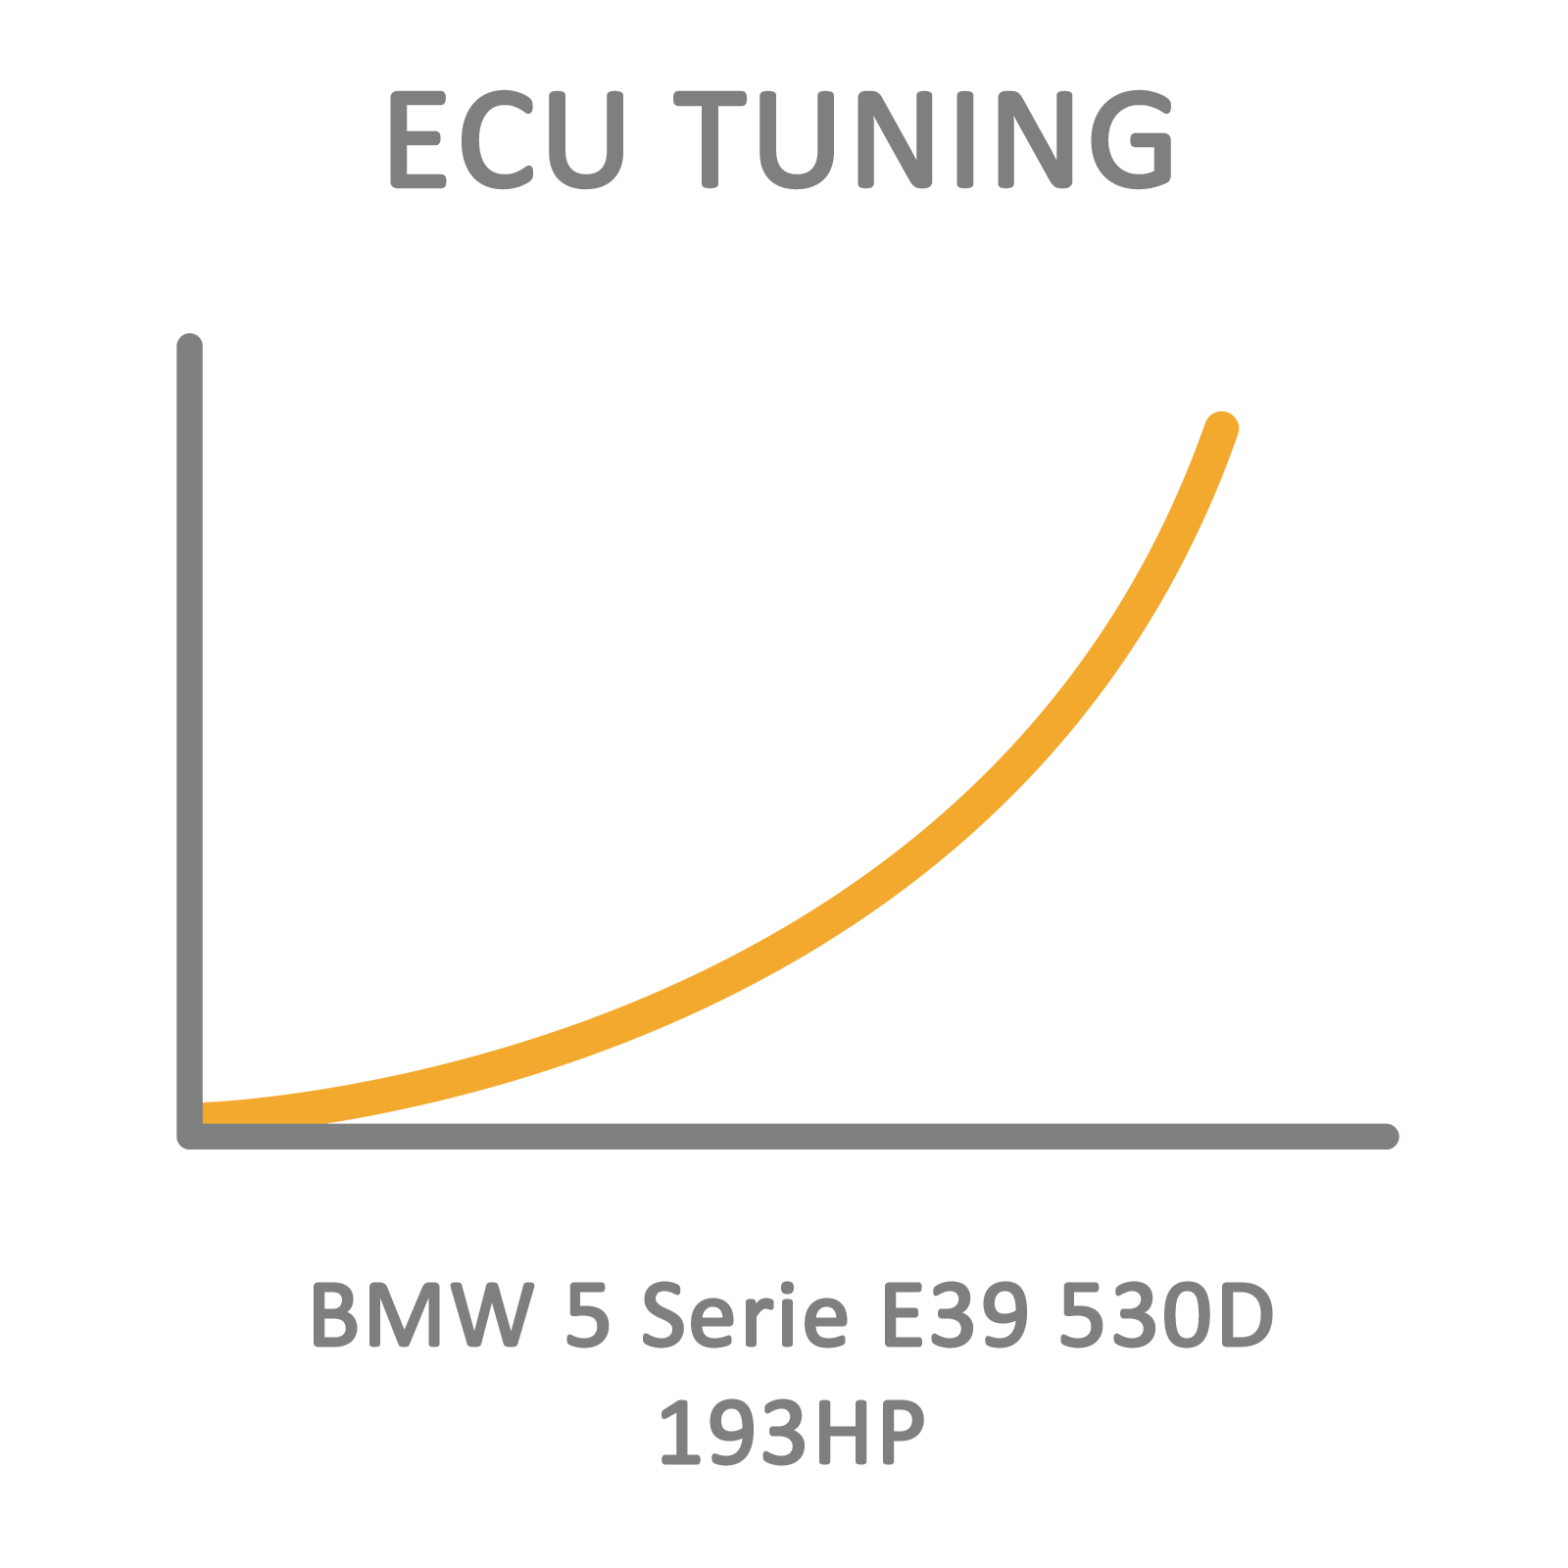 BMW 5 Series E39 530D 193HP ECU Tuning Remapping Programming